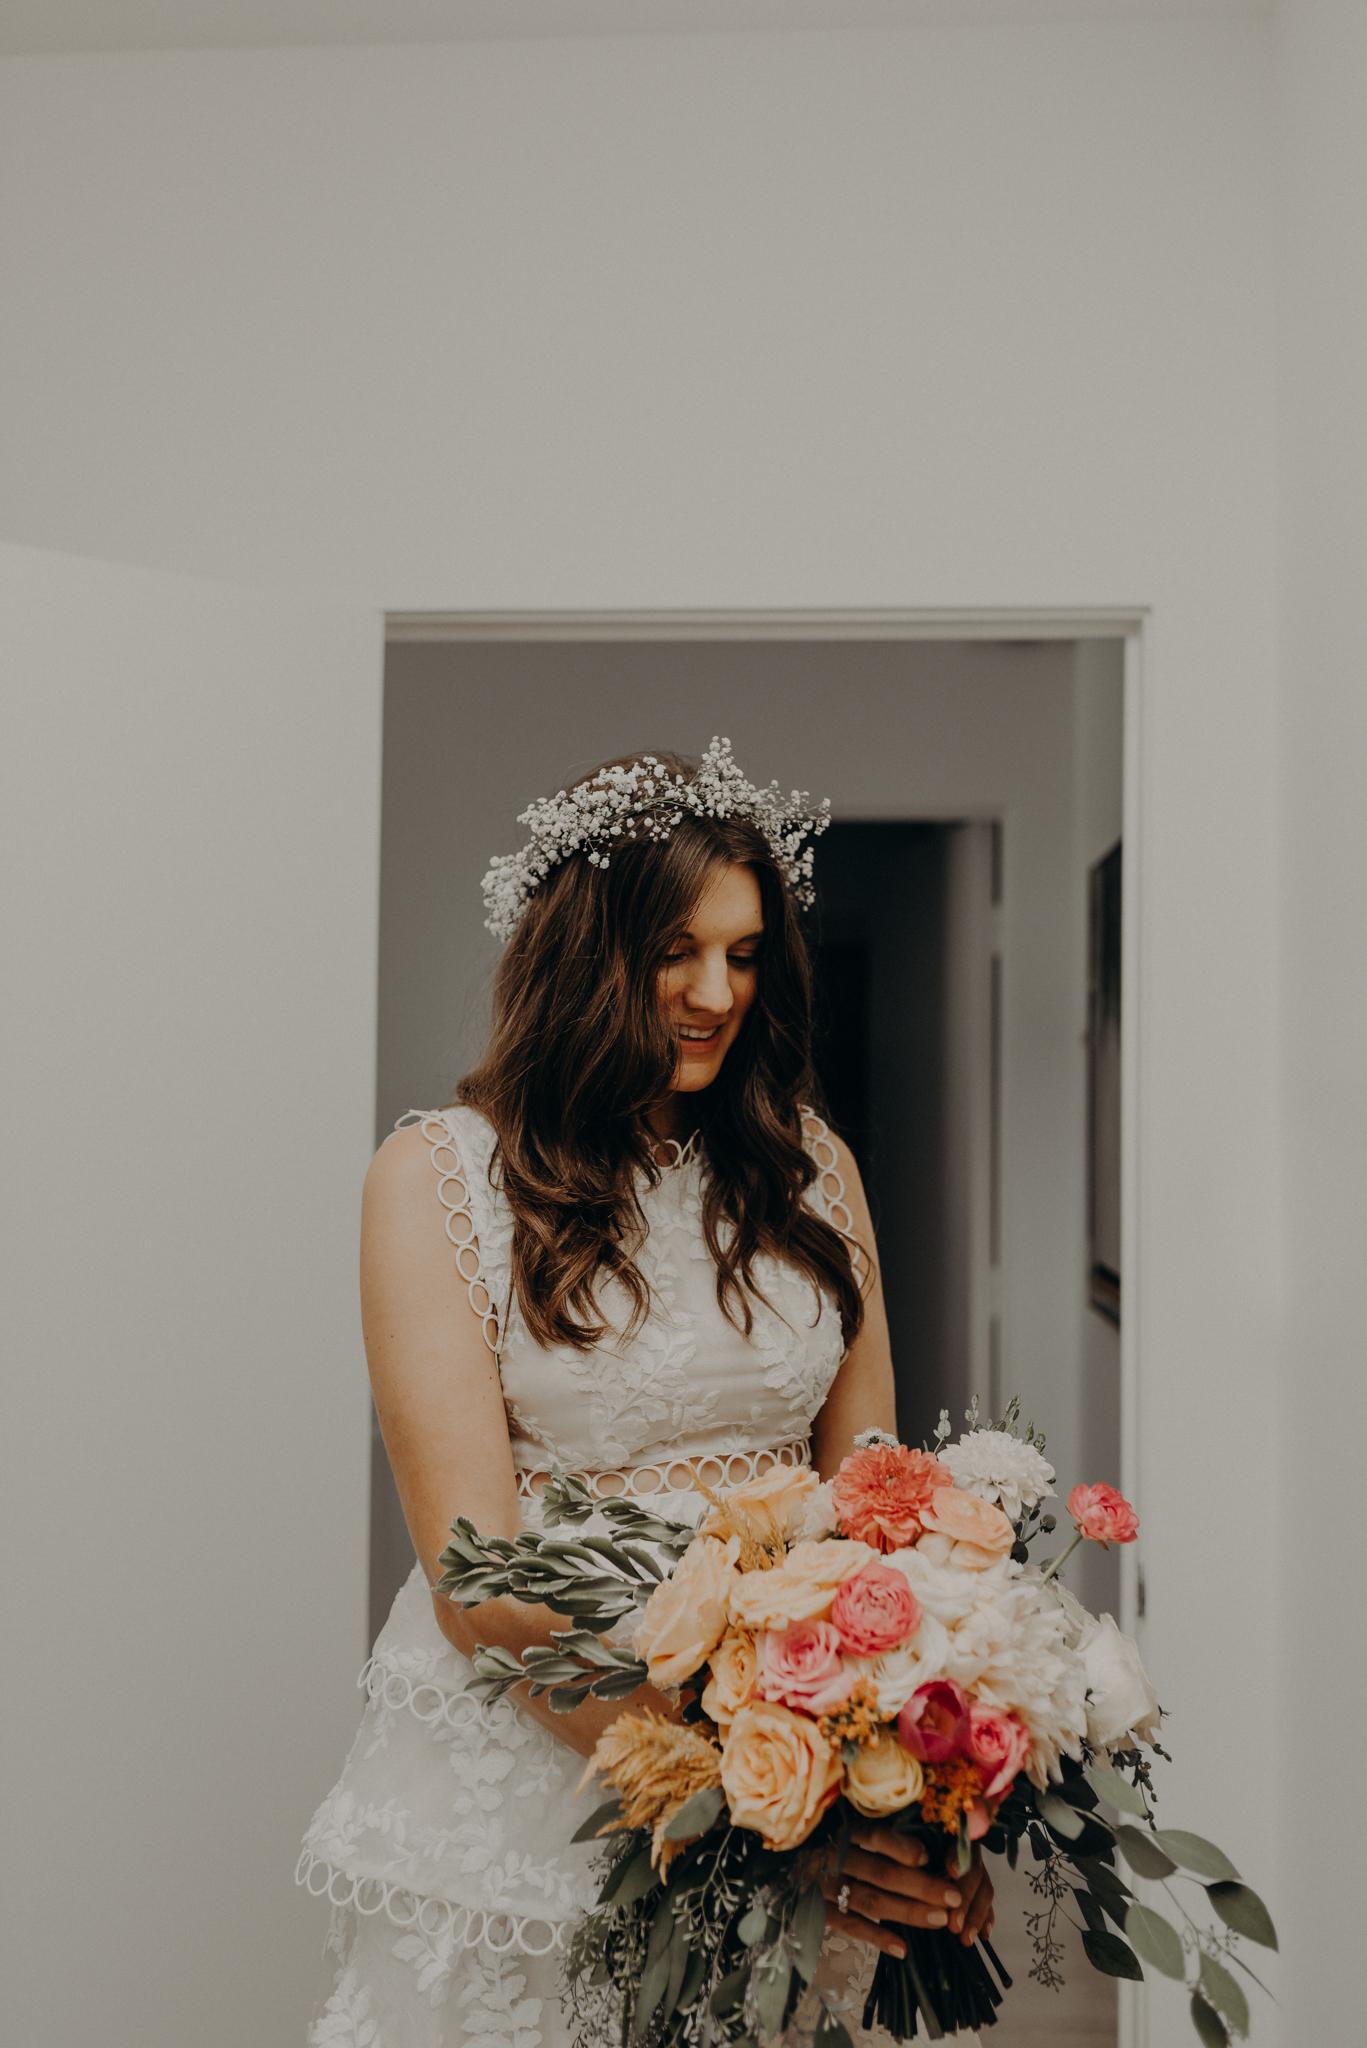 Isaiah + Taylor Photography - Private Estate Backyard Wedding - Beverly Hills - Los Angeles Wedding Photographer - 07.jpg